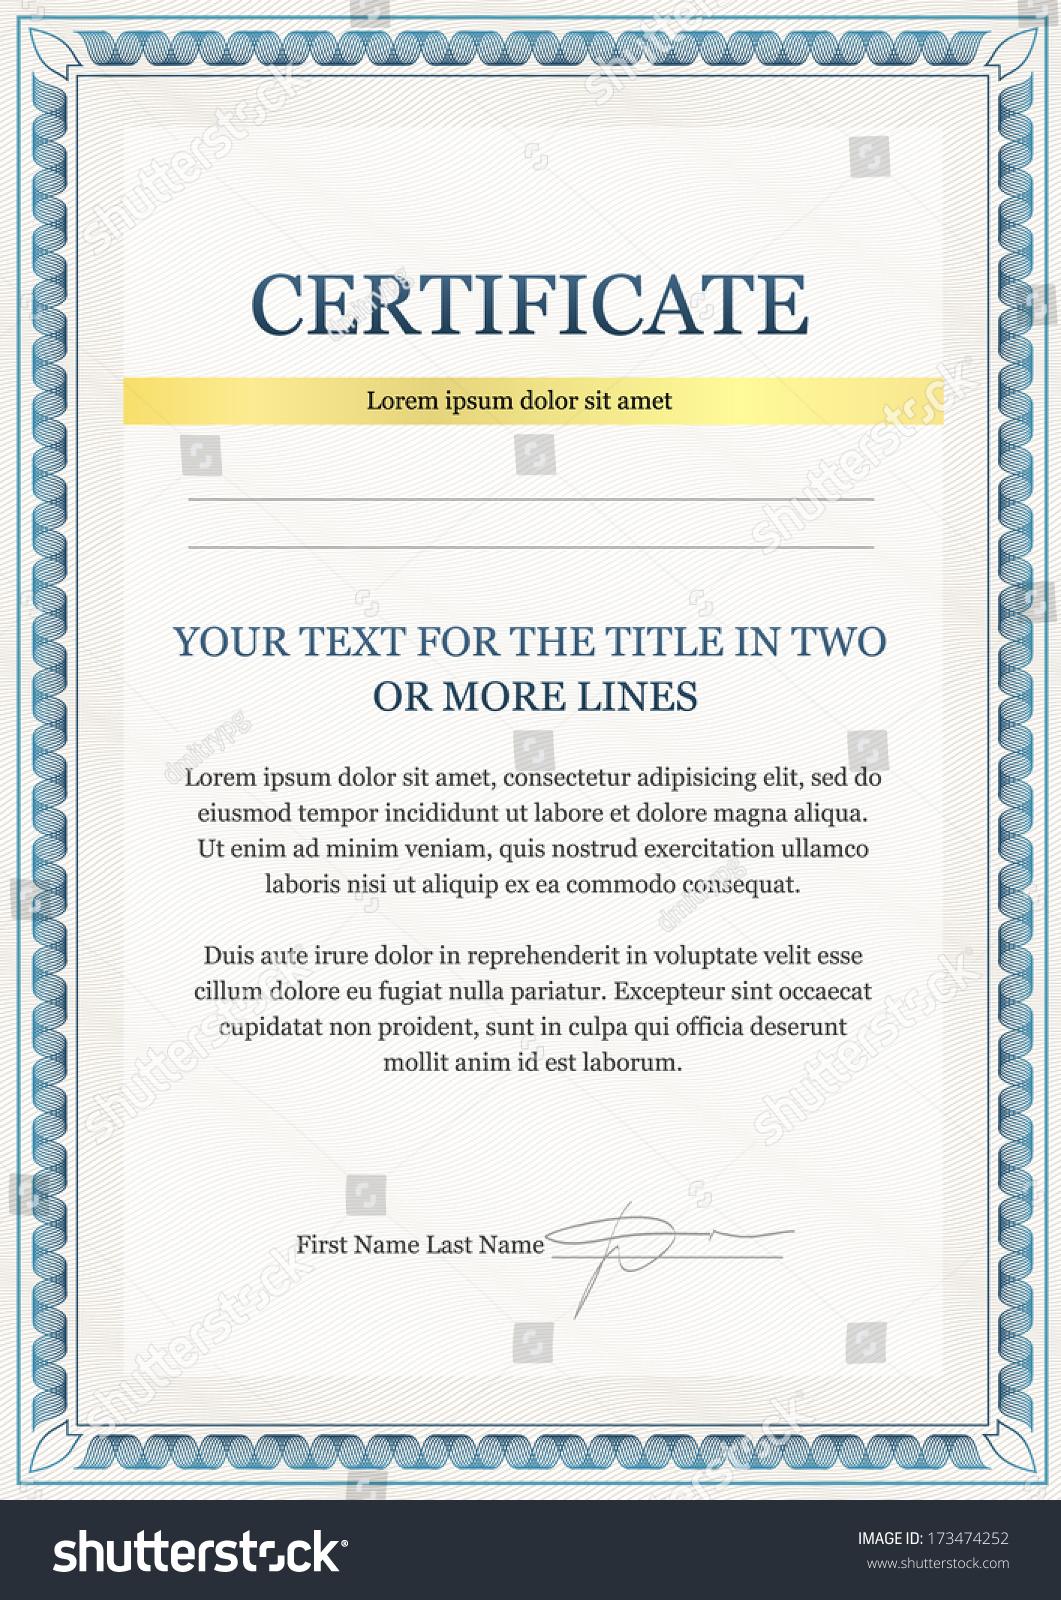 Diploma certificate template minimalist design stock vector diploma and certificate template minimalist design yelopaper Choice Image